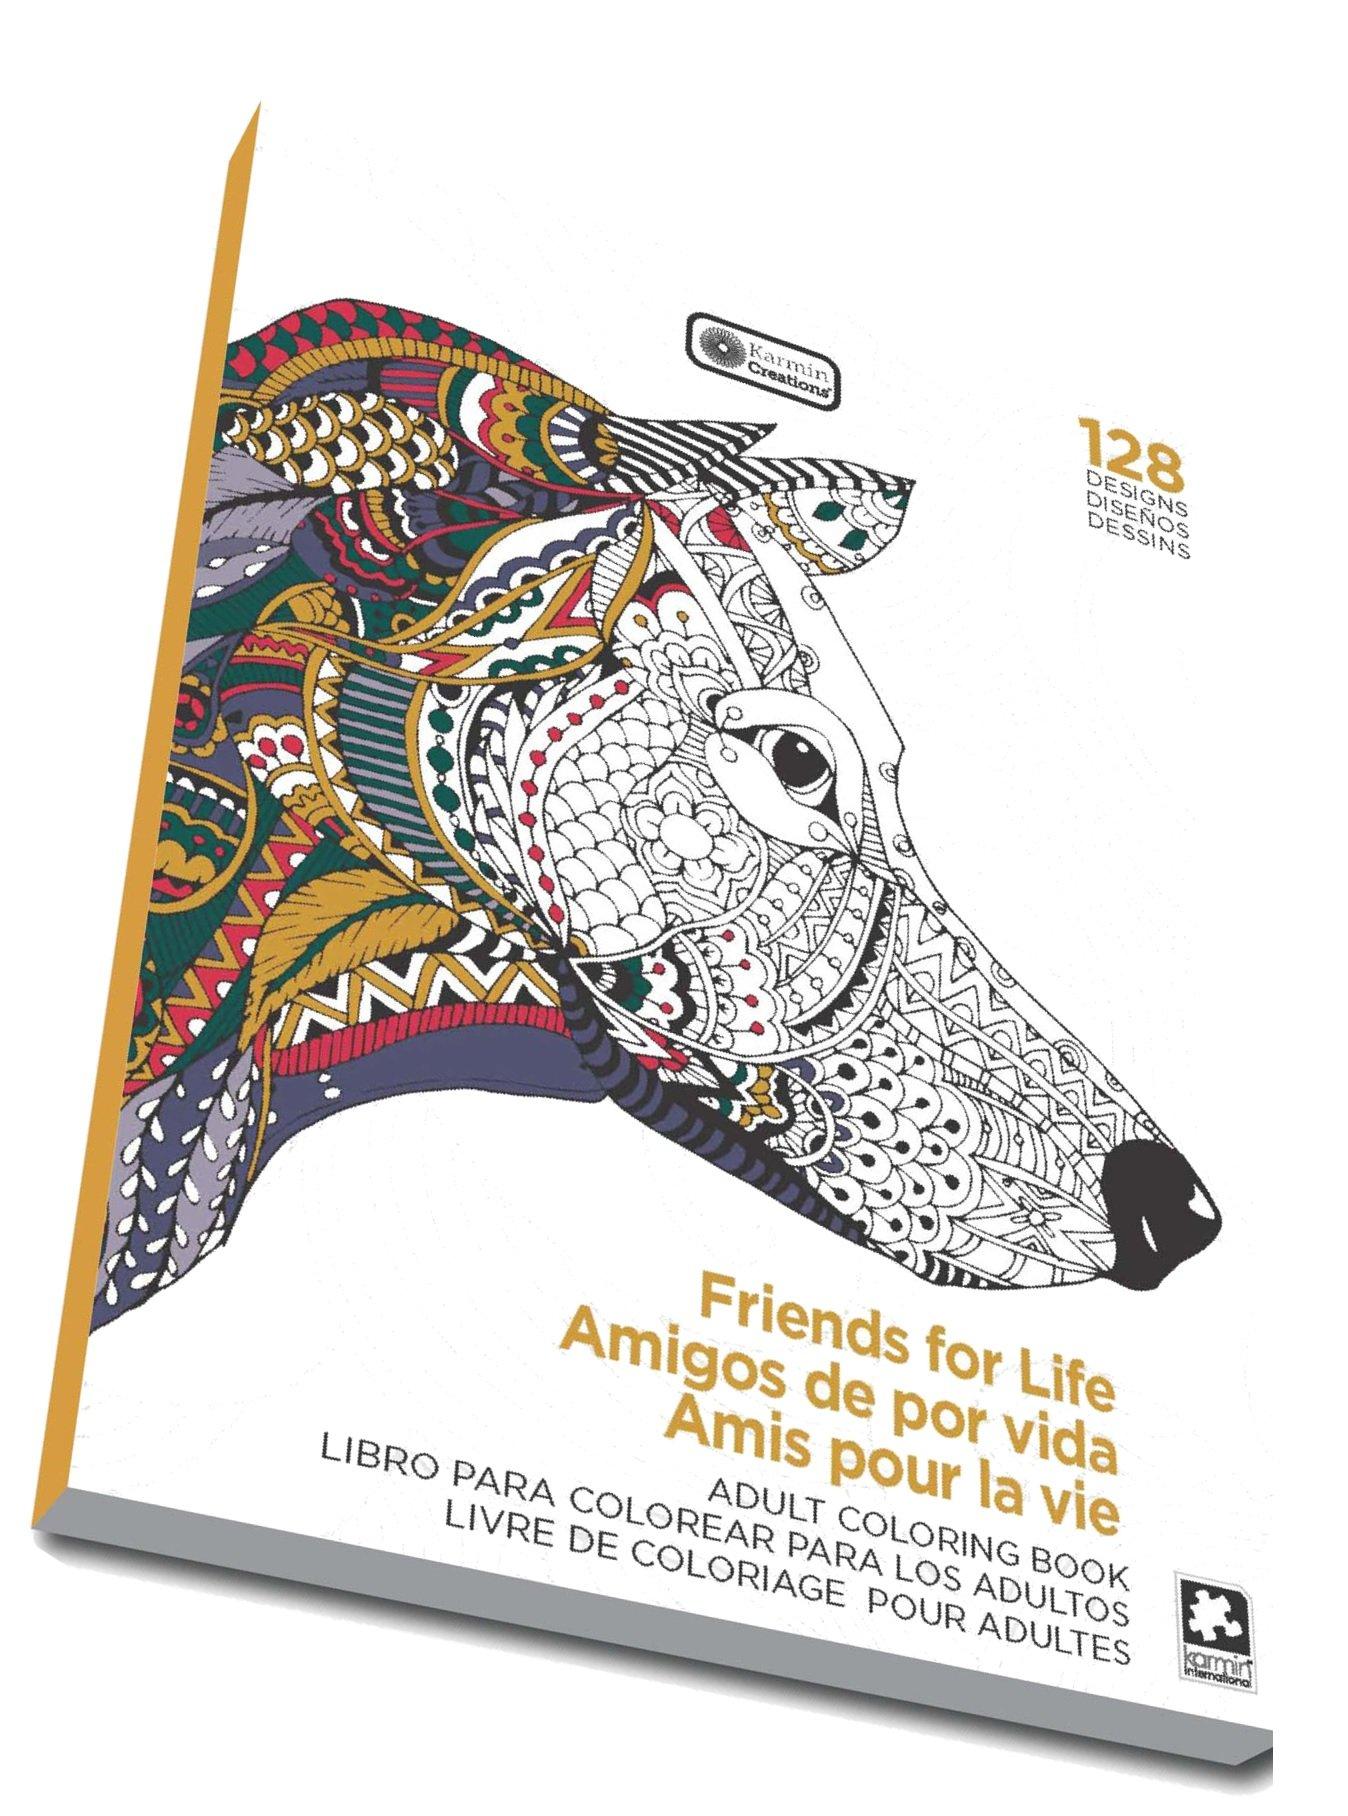 Friends For Life Mandalas Adult Coloring Book 128 Designs